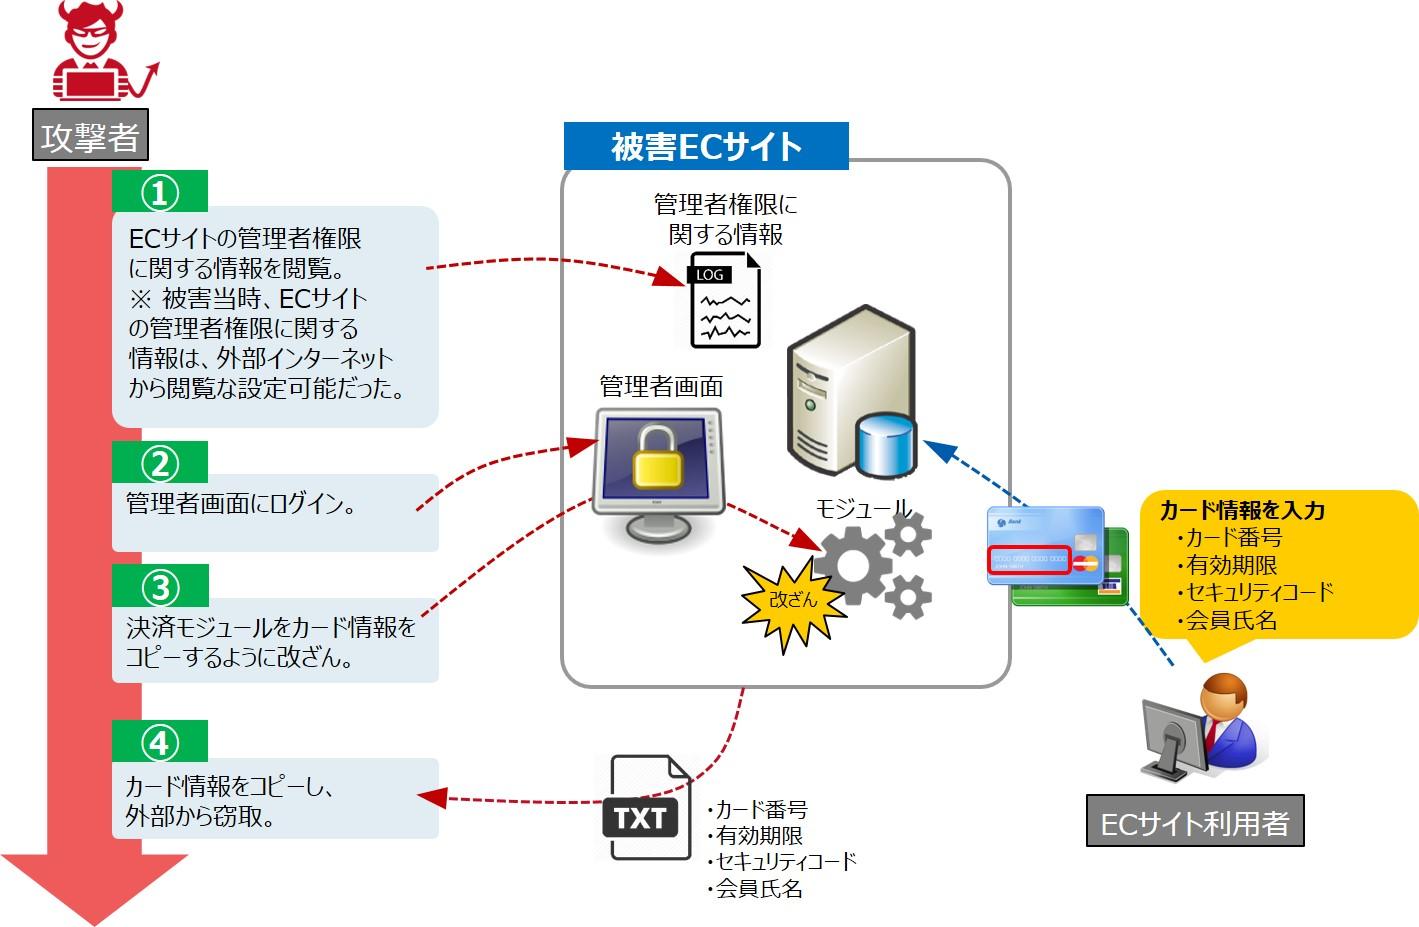 ECサイトの脆弱性を利用した攻撃の流れa